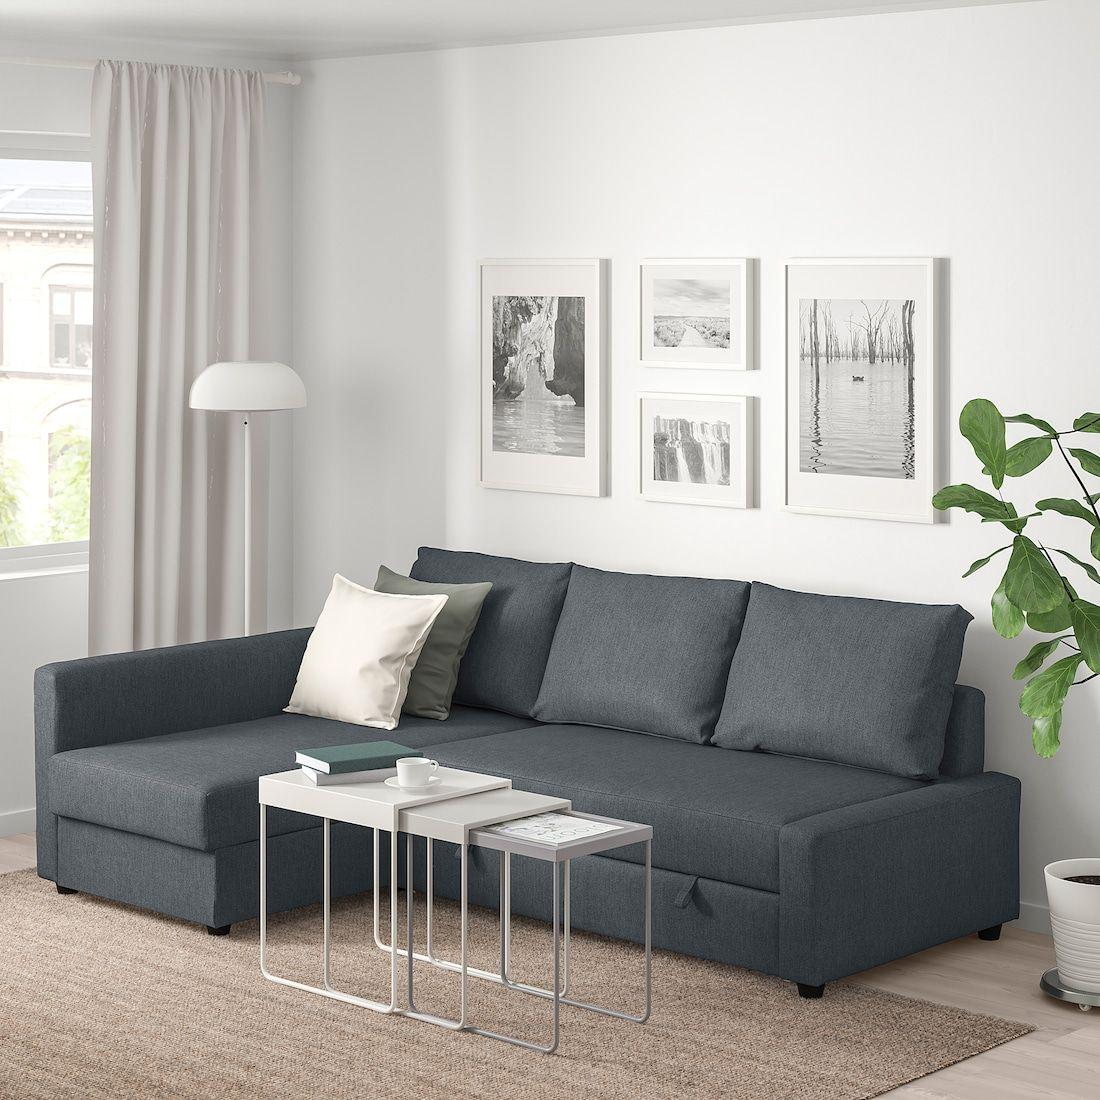 Friheten Sleeper Sectional 3 Seat W Storage Hyllie Dark Gray Corner Sofa Bed With Storage Corner Sofa Bed Storage